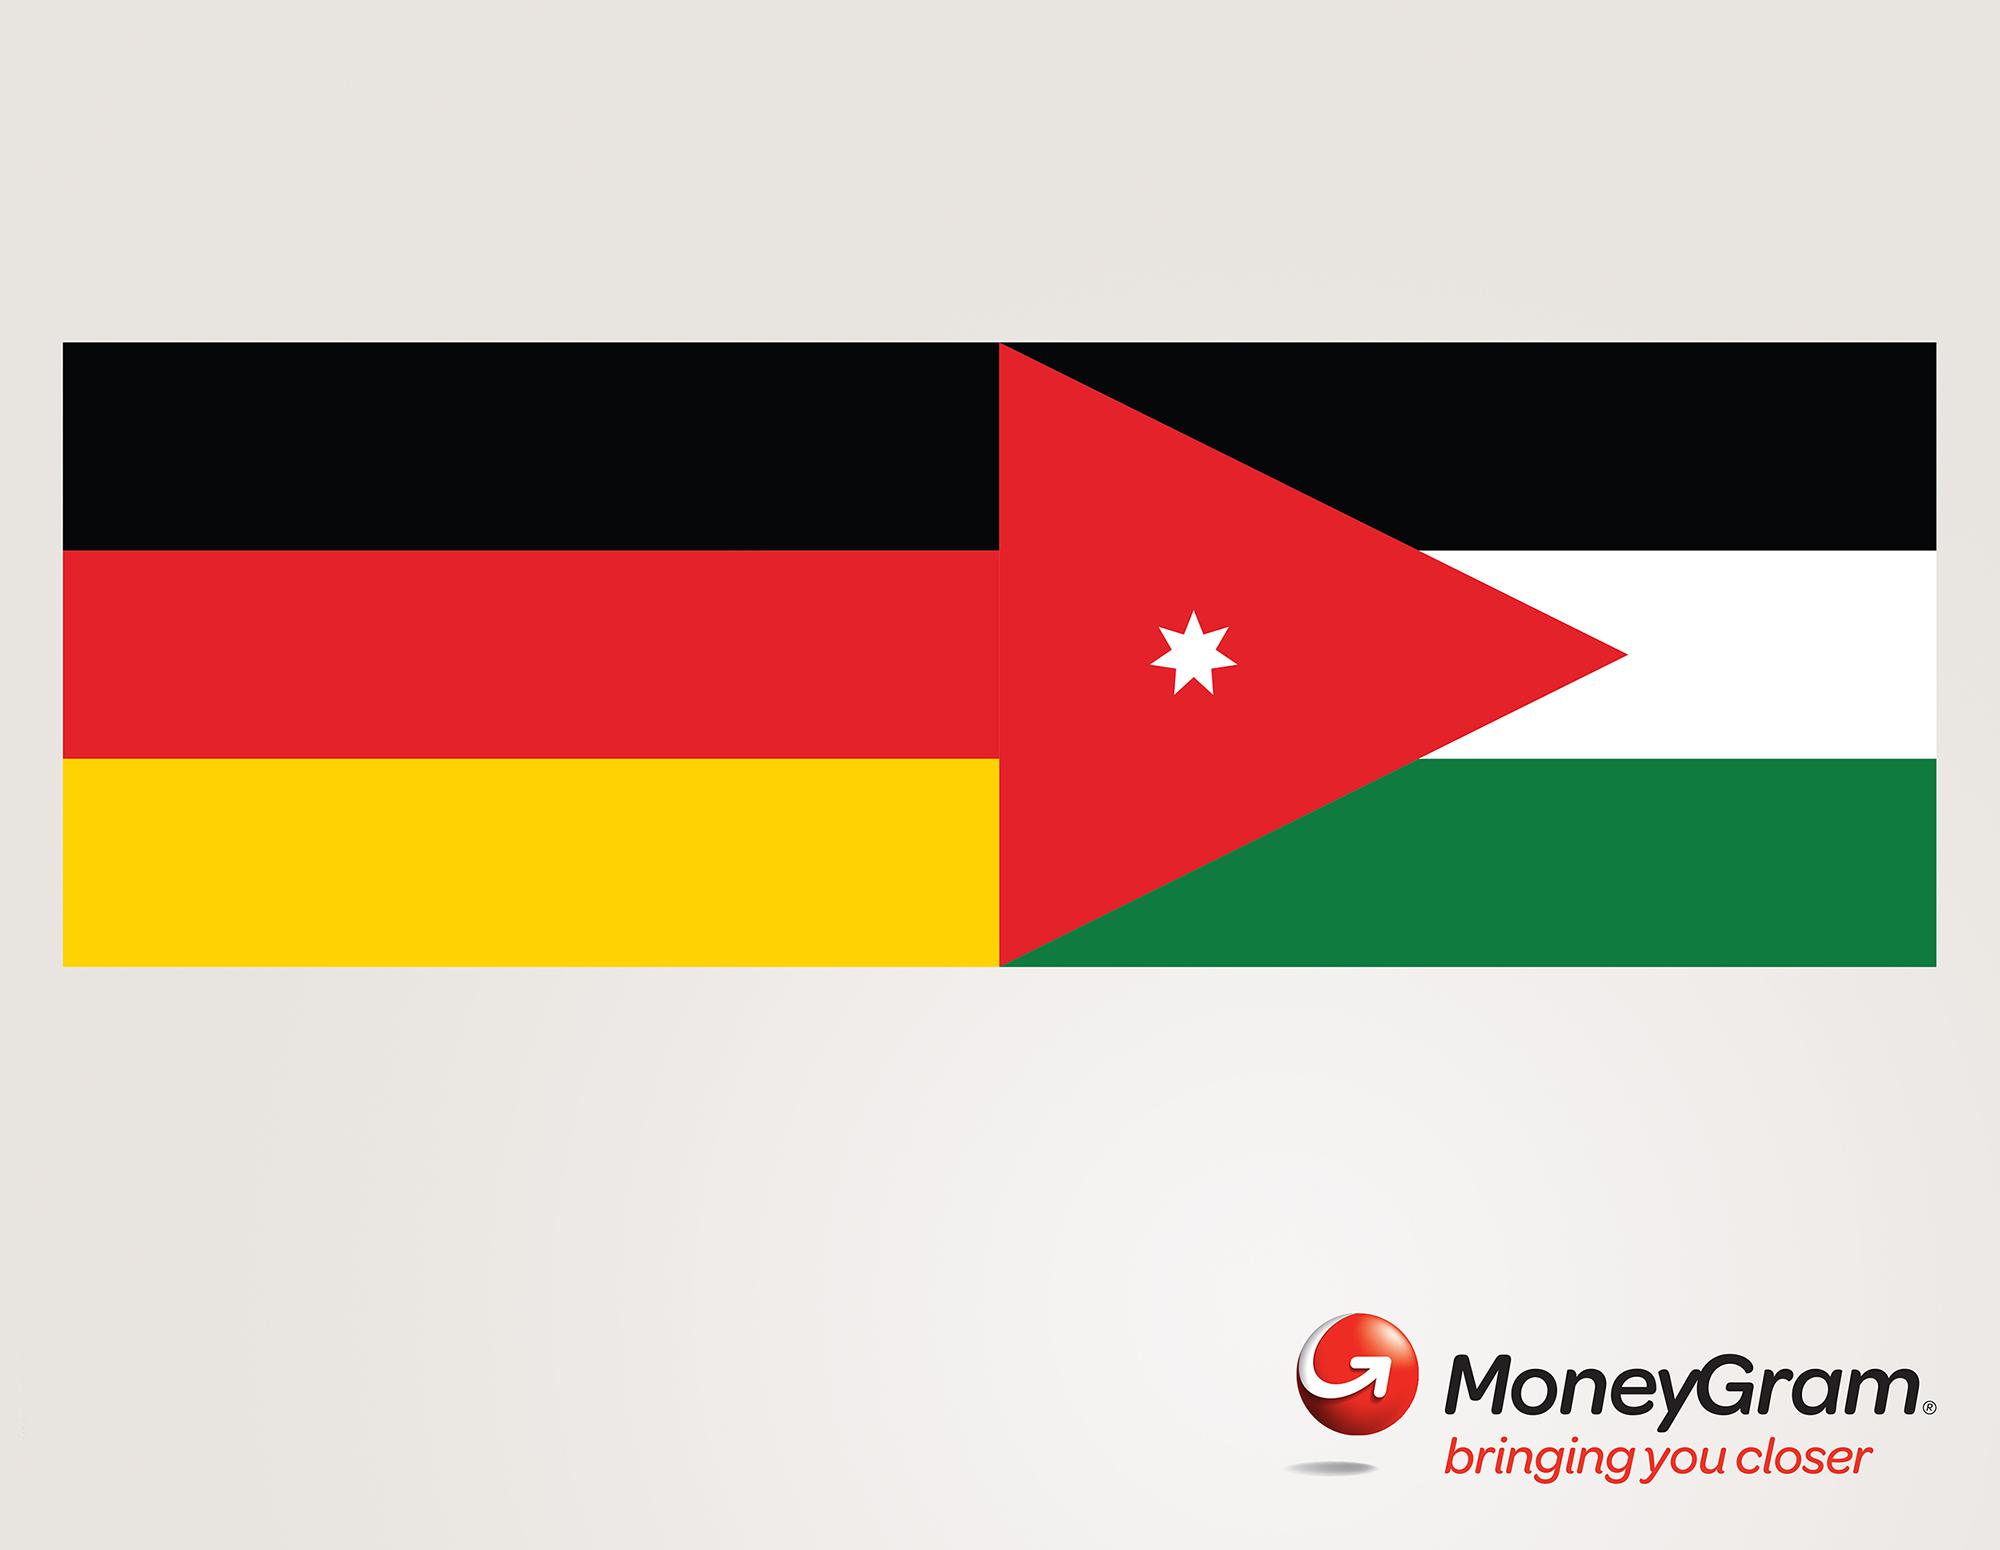 Moneygram 'Flags' Germany-Jordan